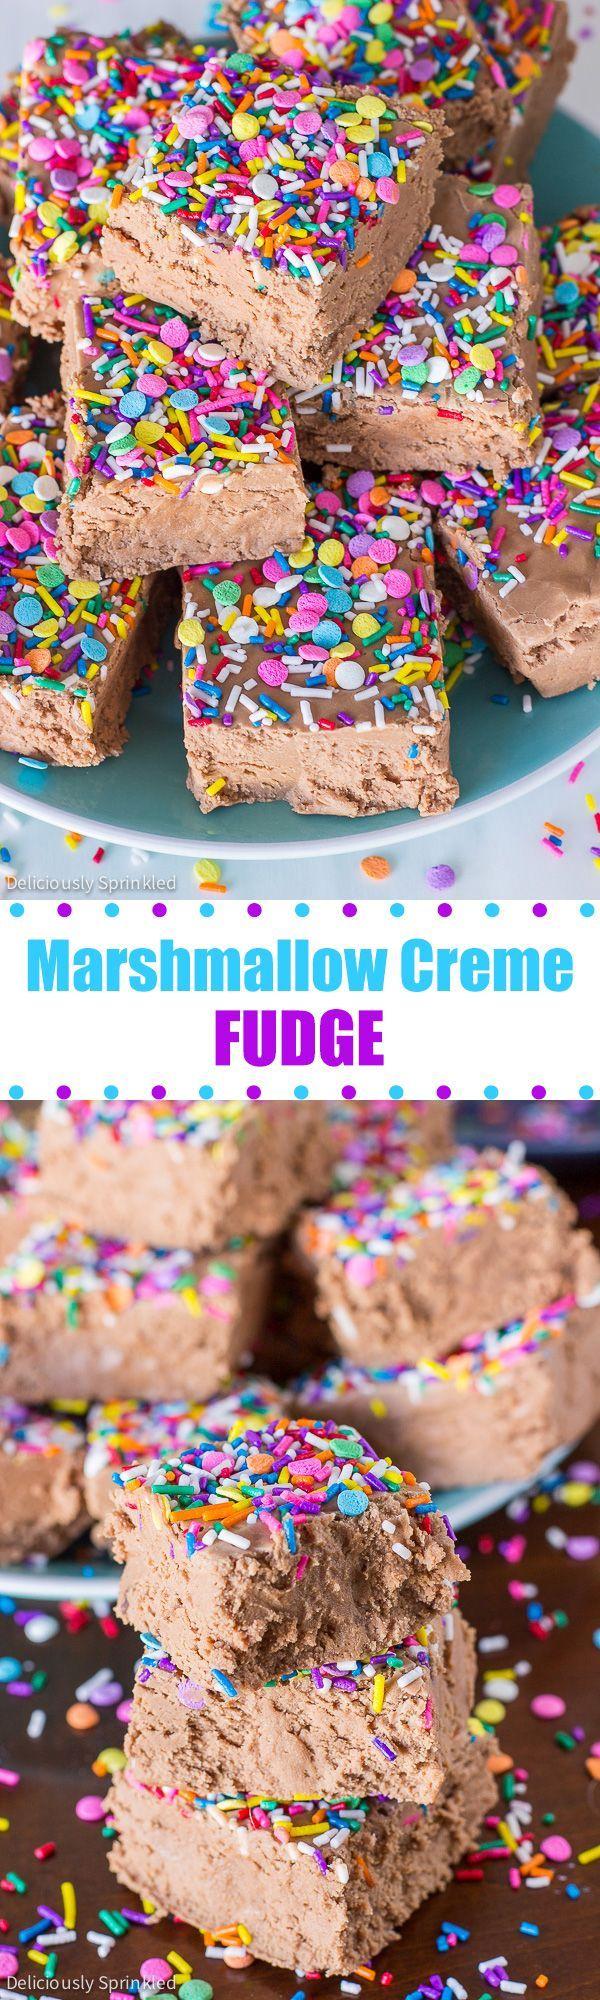 Marshmallow Creme Fudge